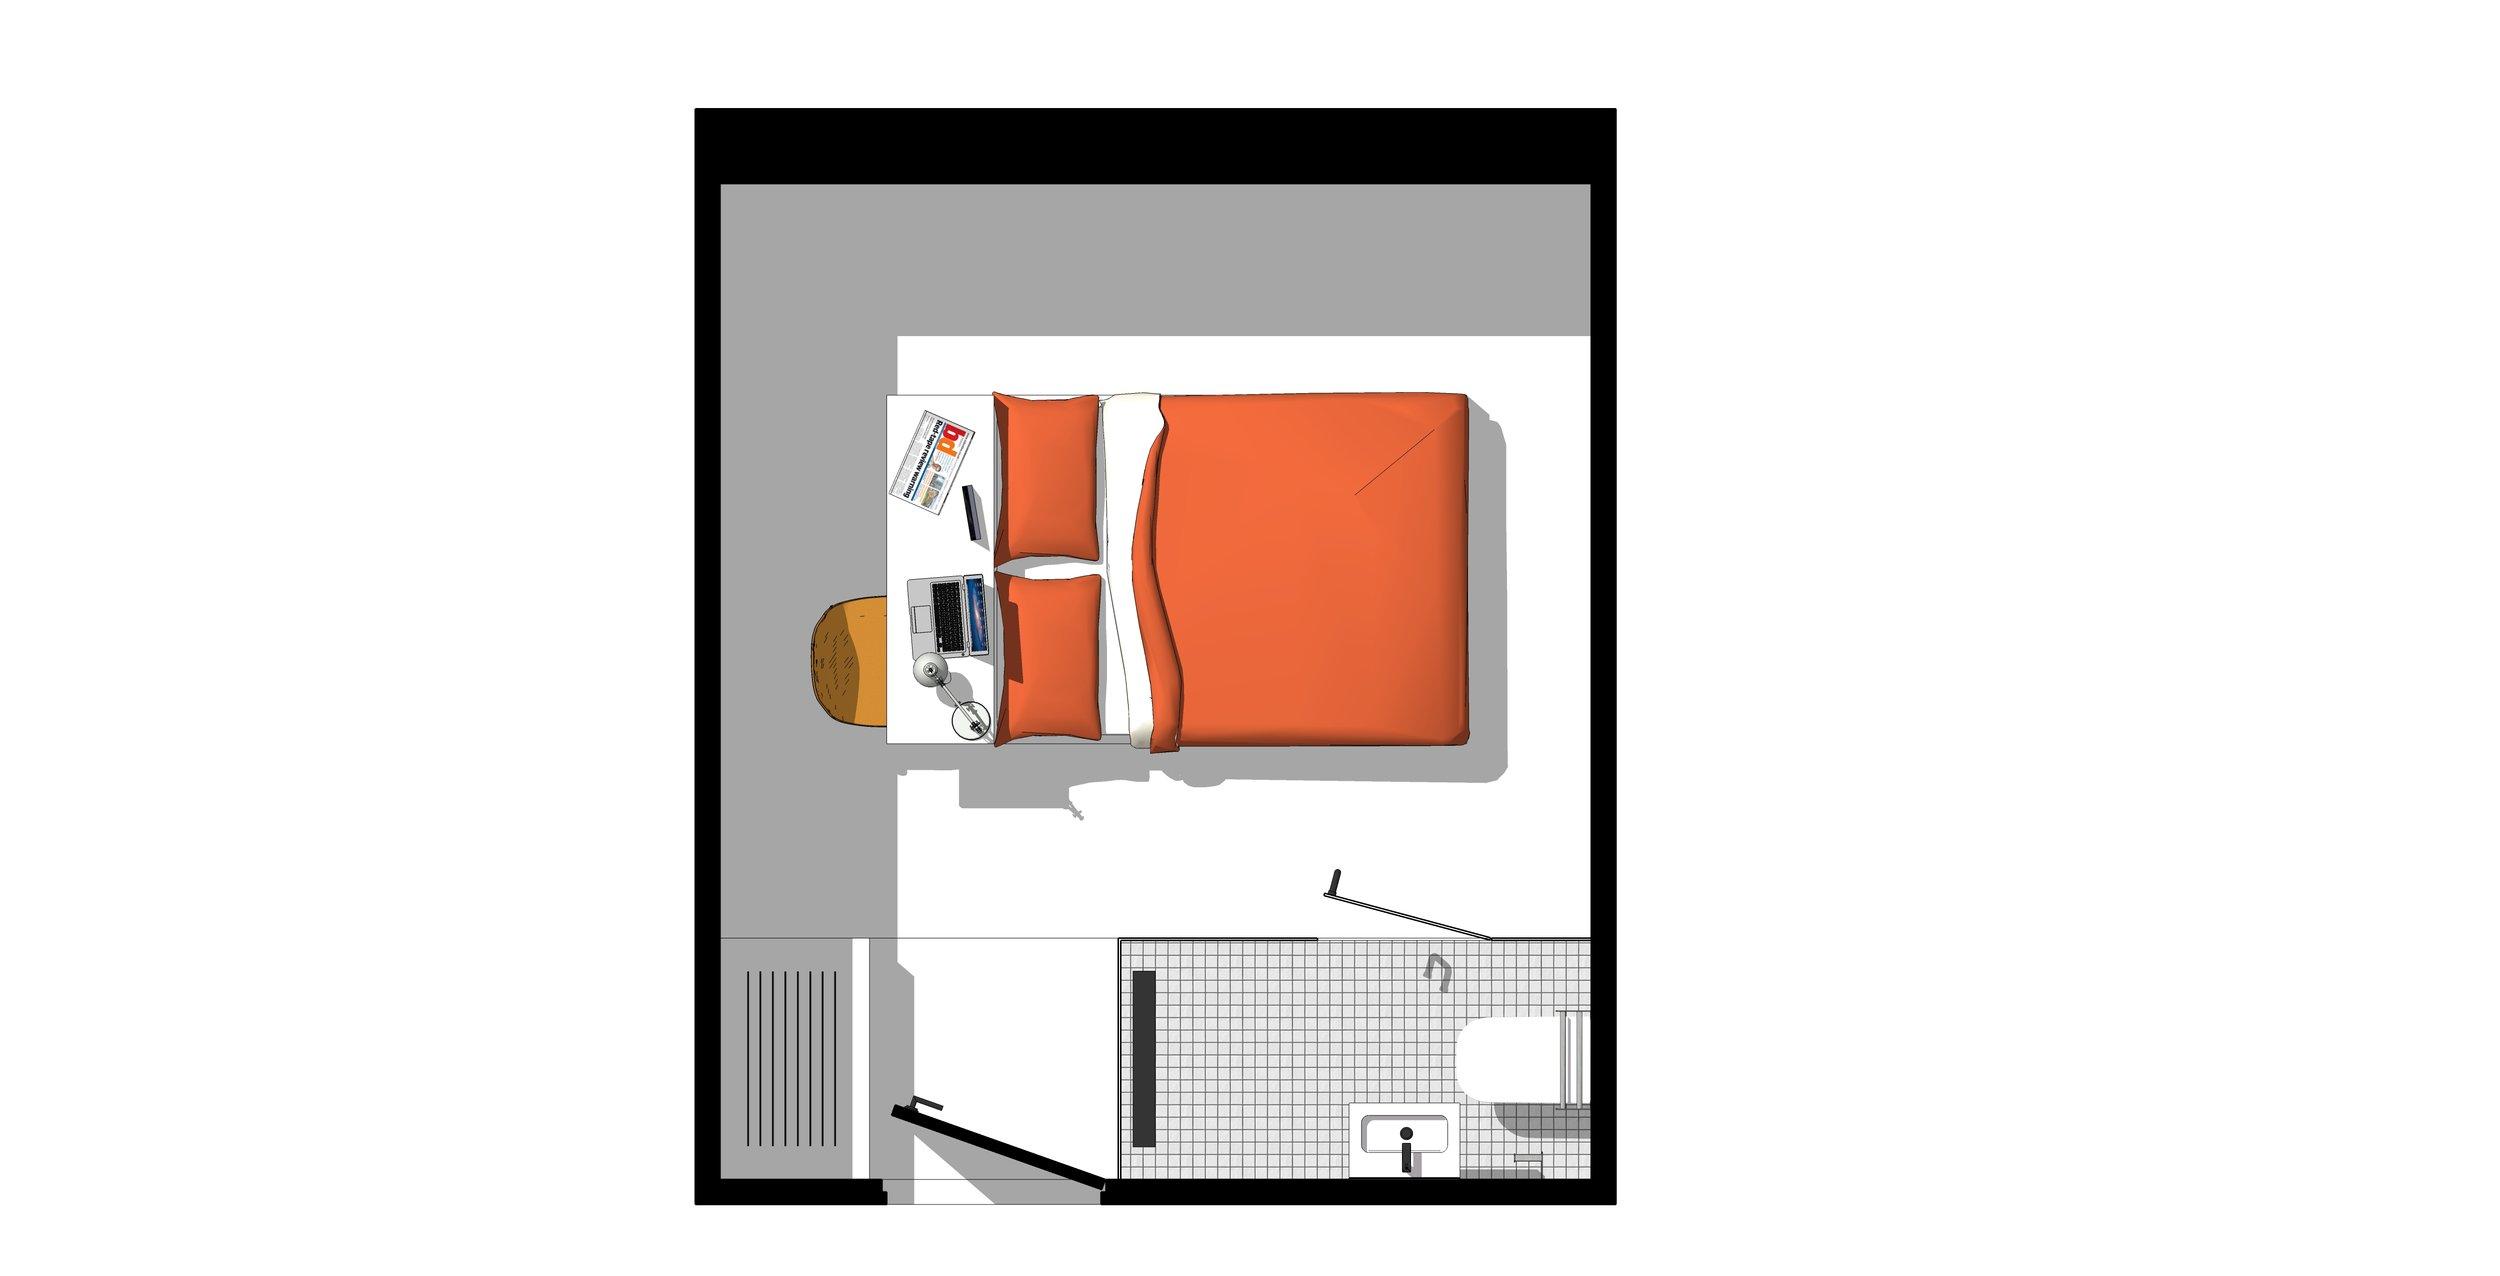 plan style 01.jpg